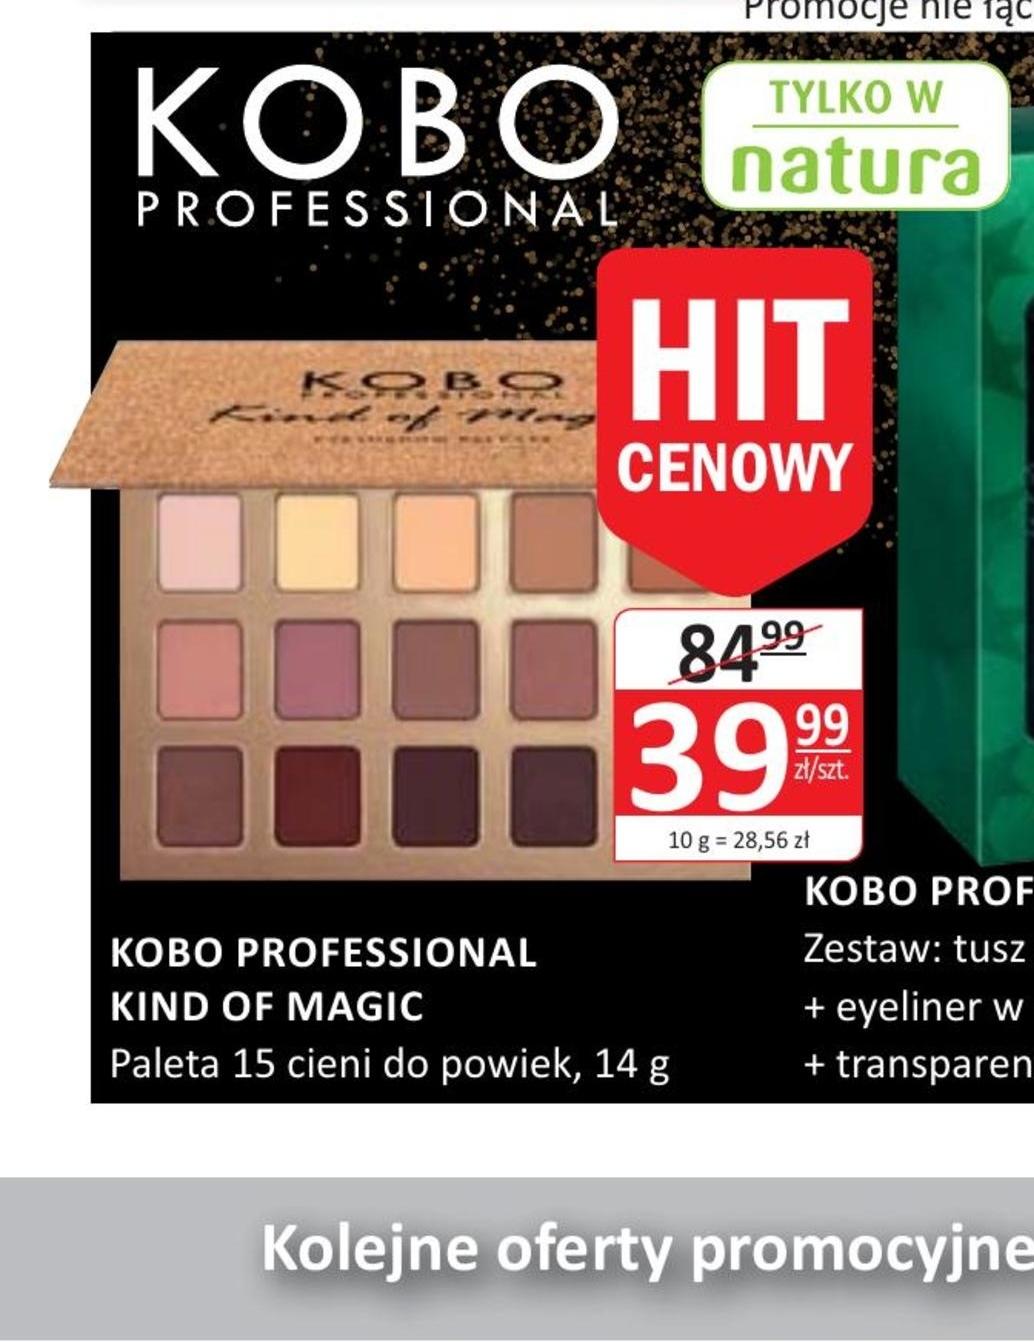 Paleta cieni Kobo Professional niska cena